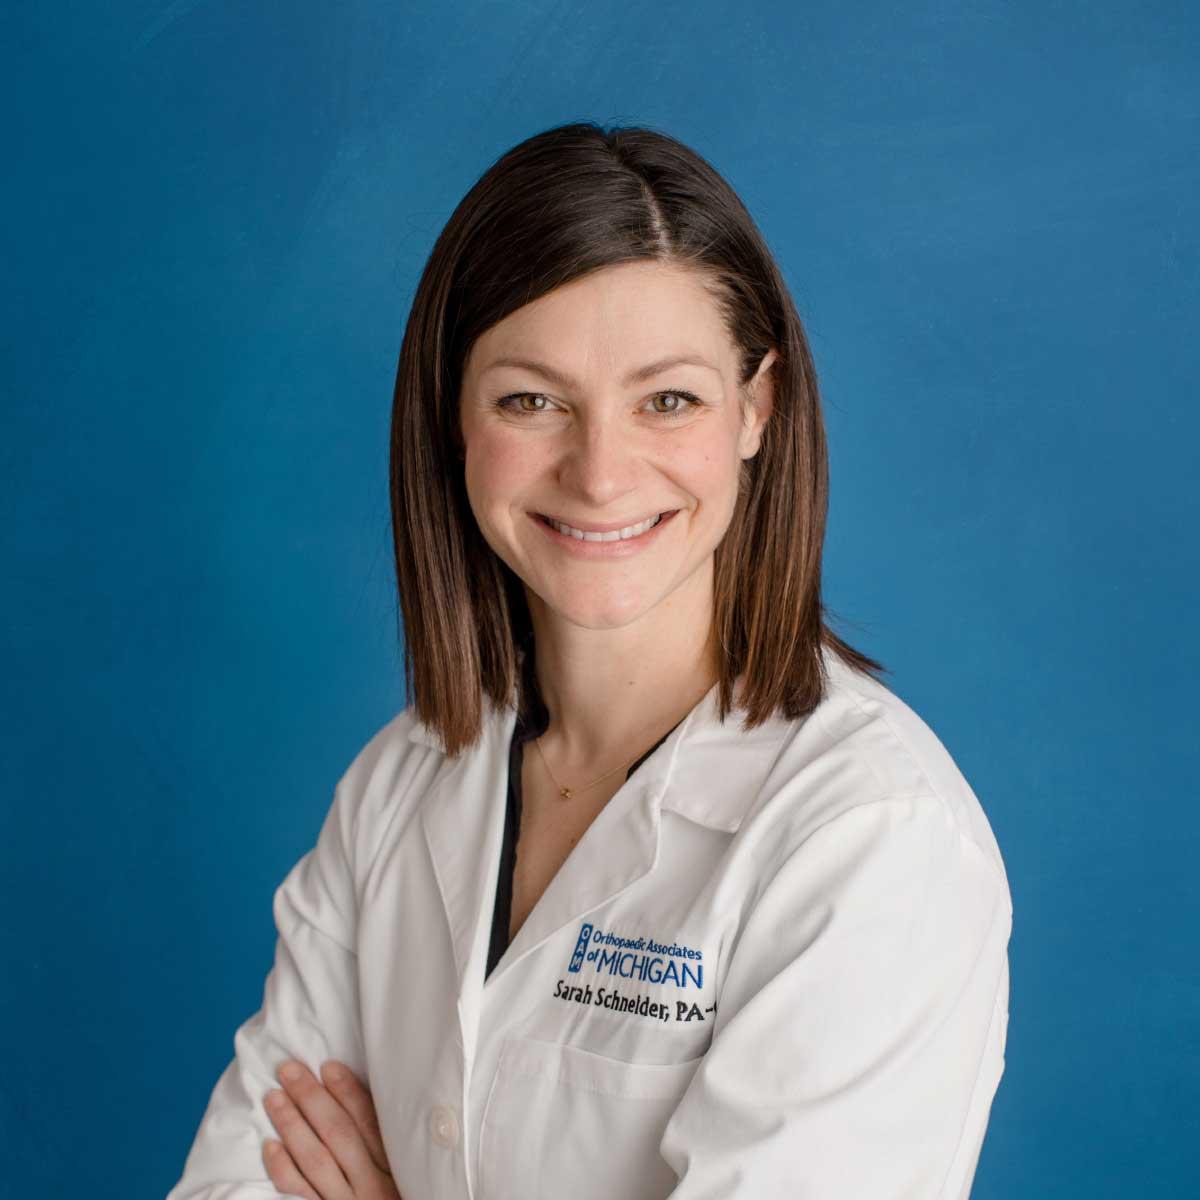 Sarah Schneider, PA-C